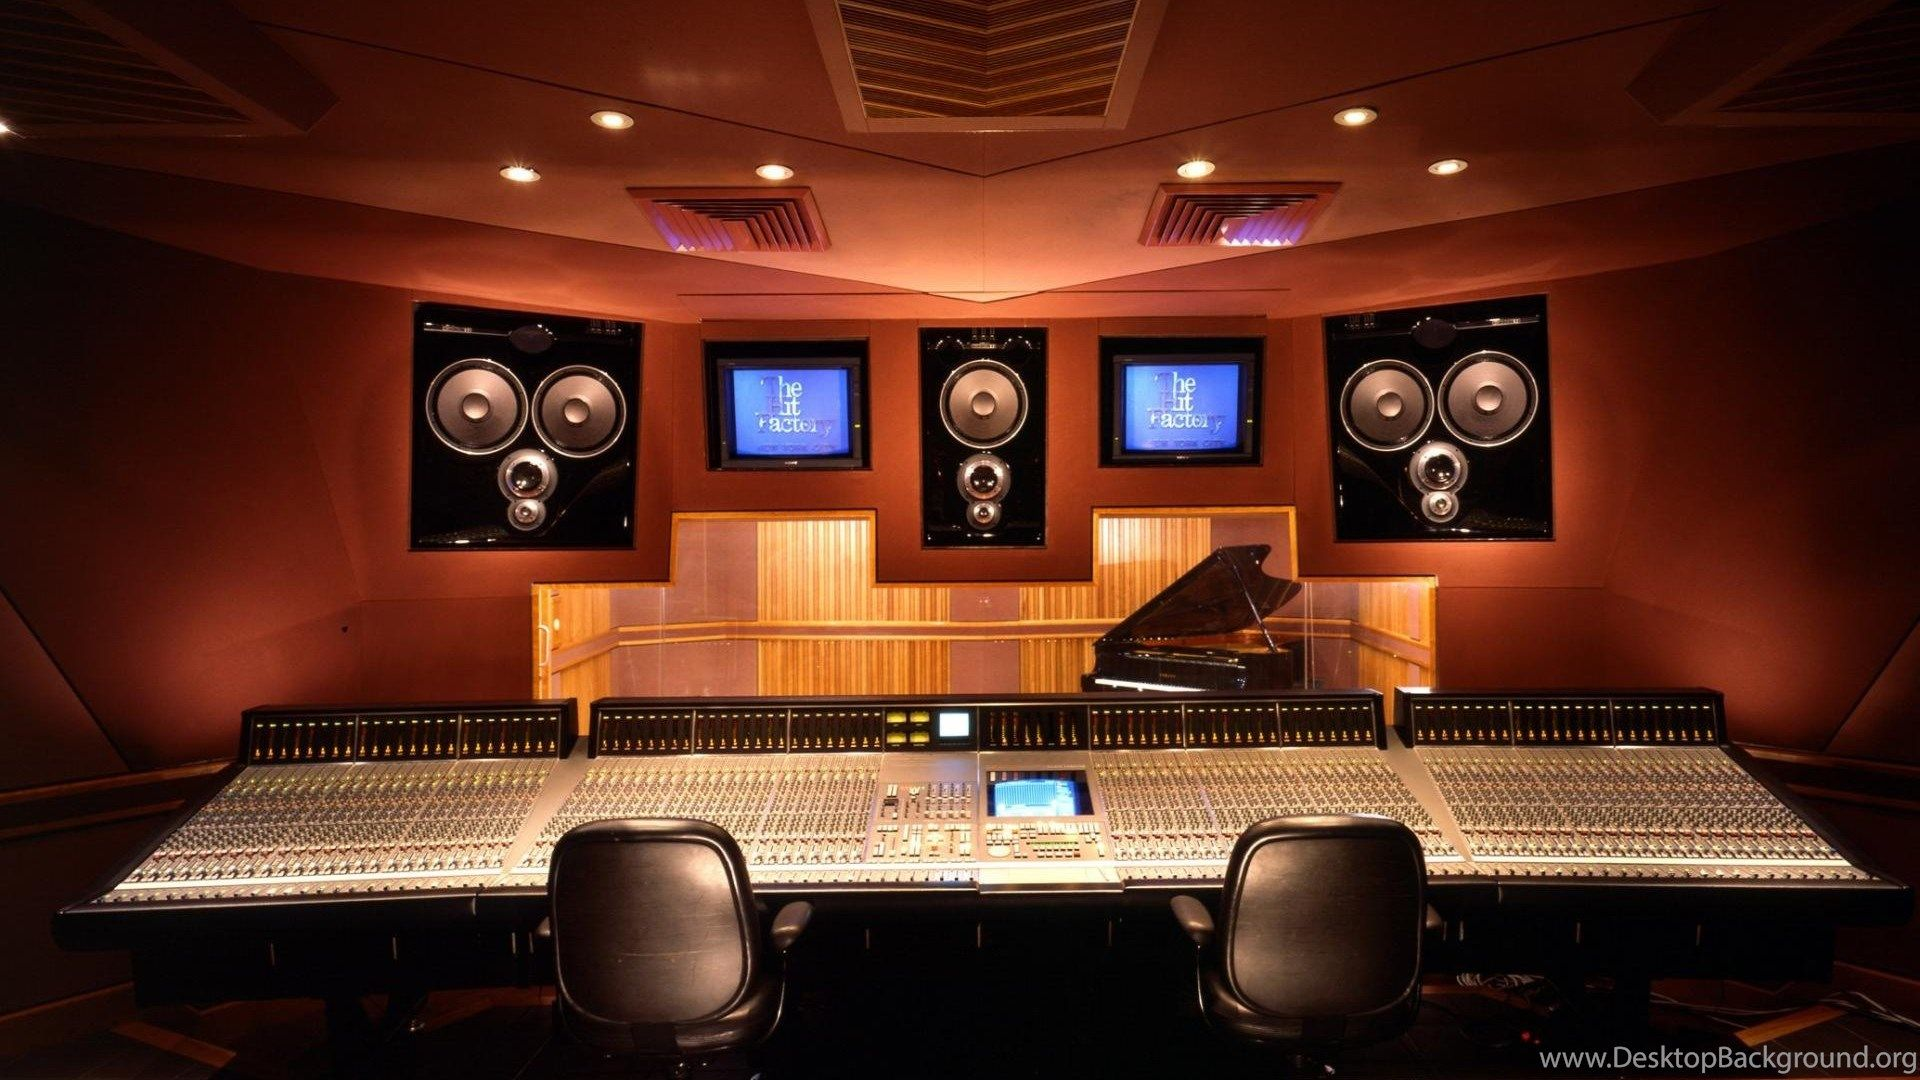 Studio hd wallpapers top free studio hd backgrounds - Music recording studio wallpaper ...